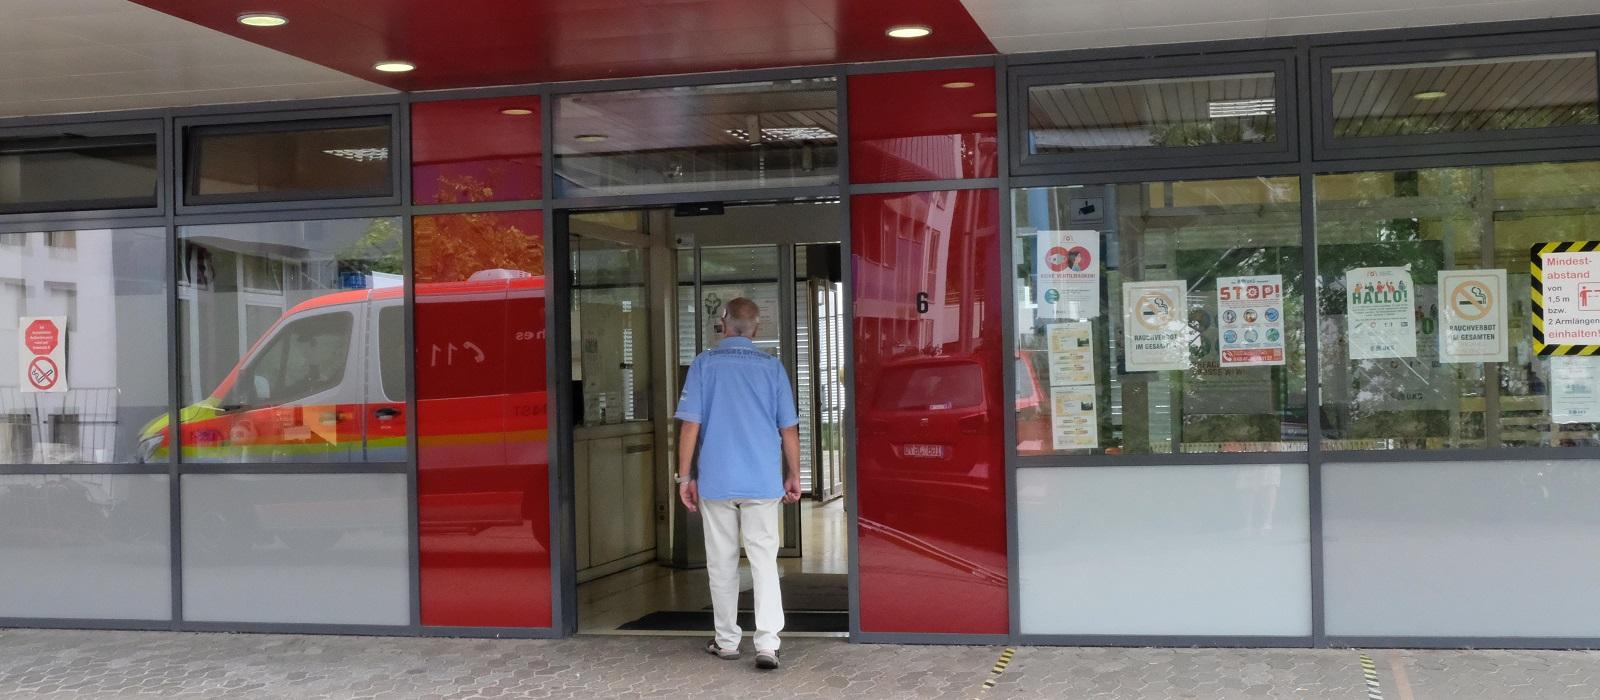 Eingang zum Klinikum